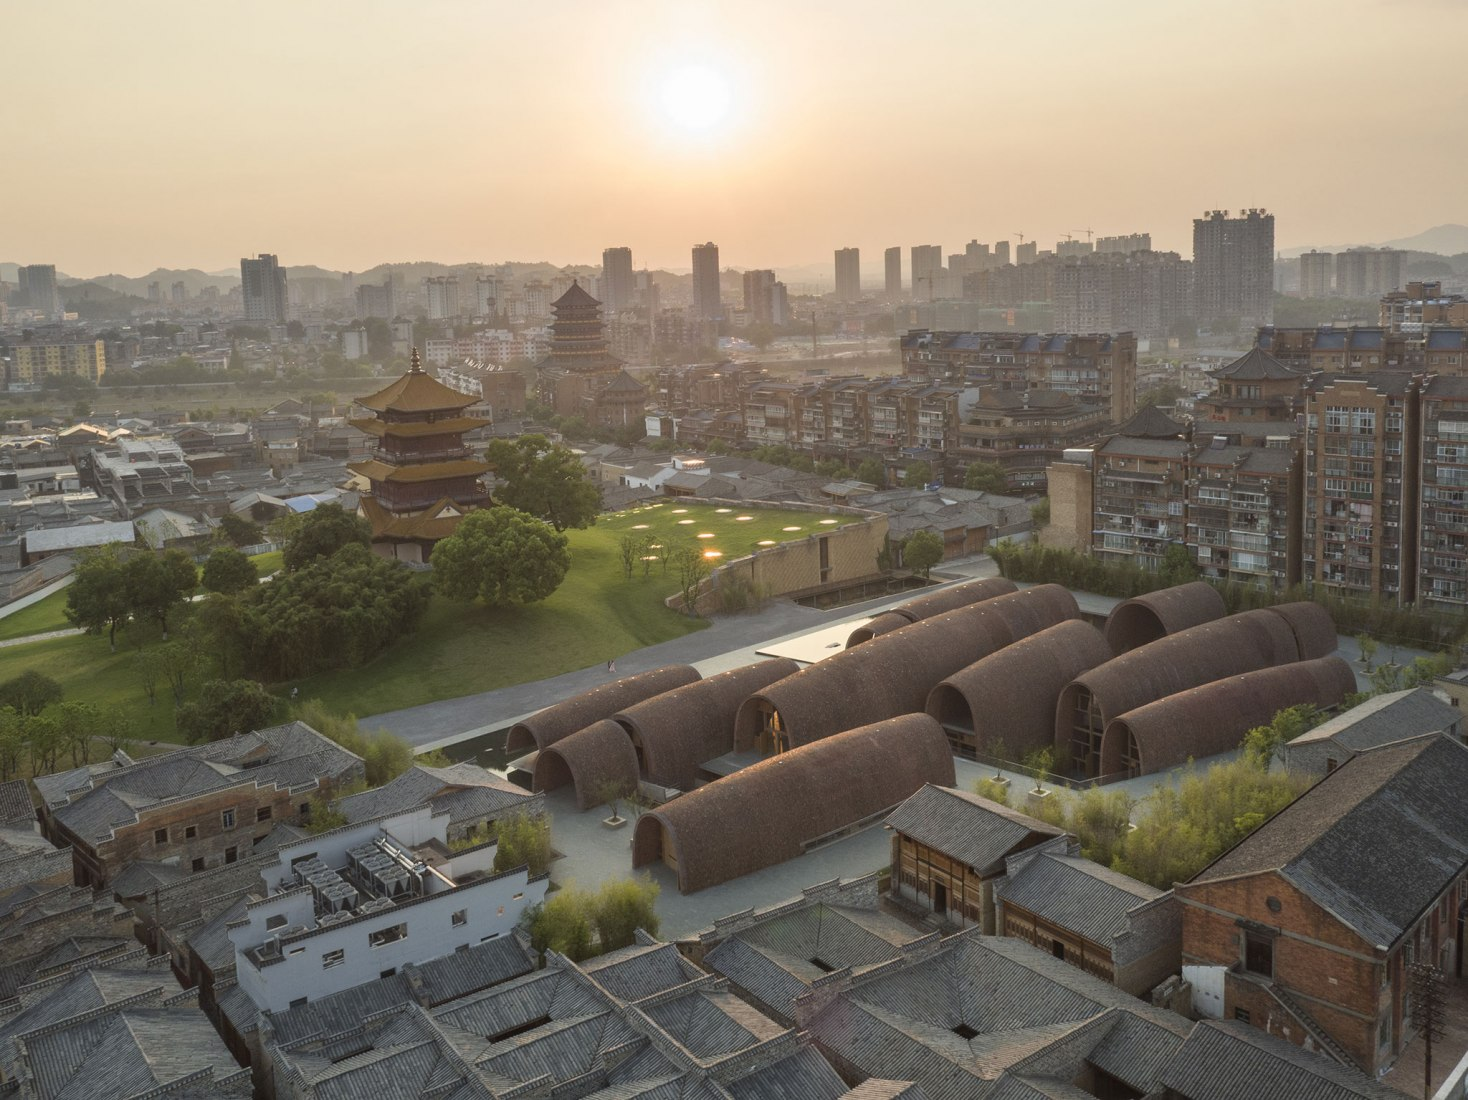 Museo del Horno Imperial Jingdezhen por Studio Zhu-Pei. Fotografía por Tian Fangfang